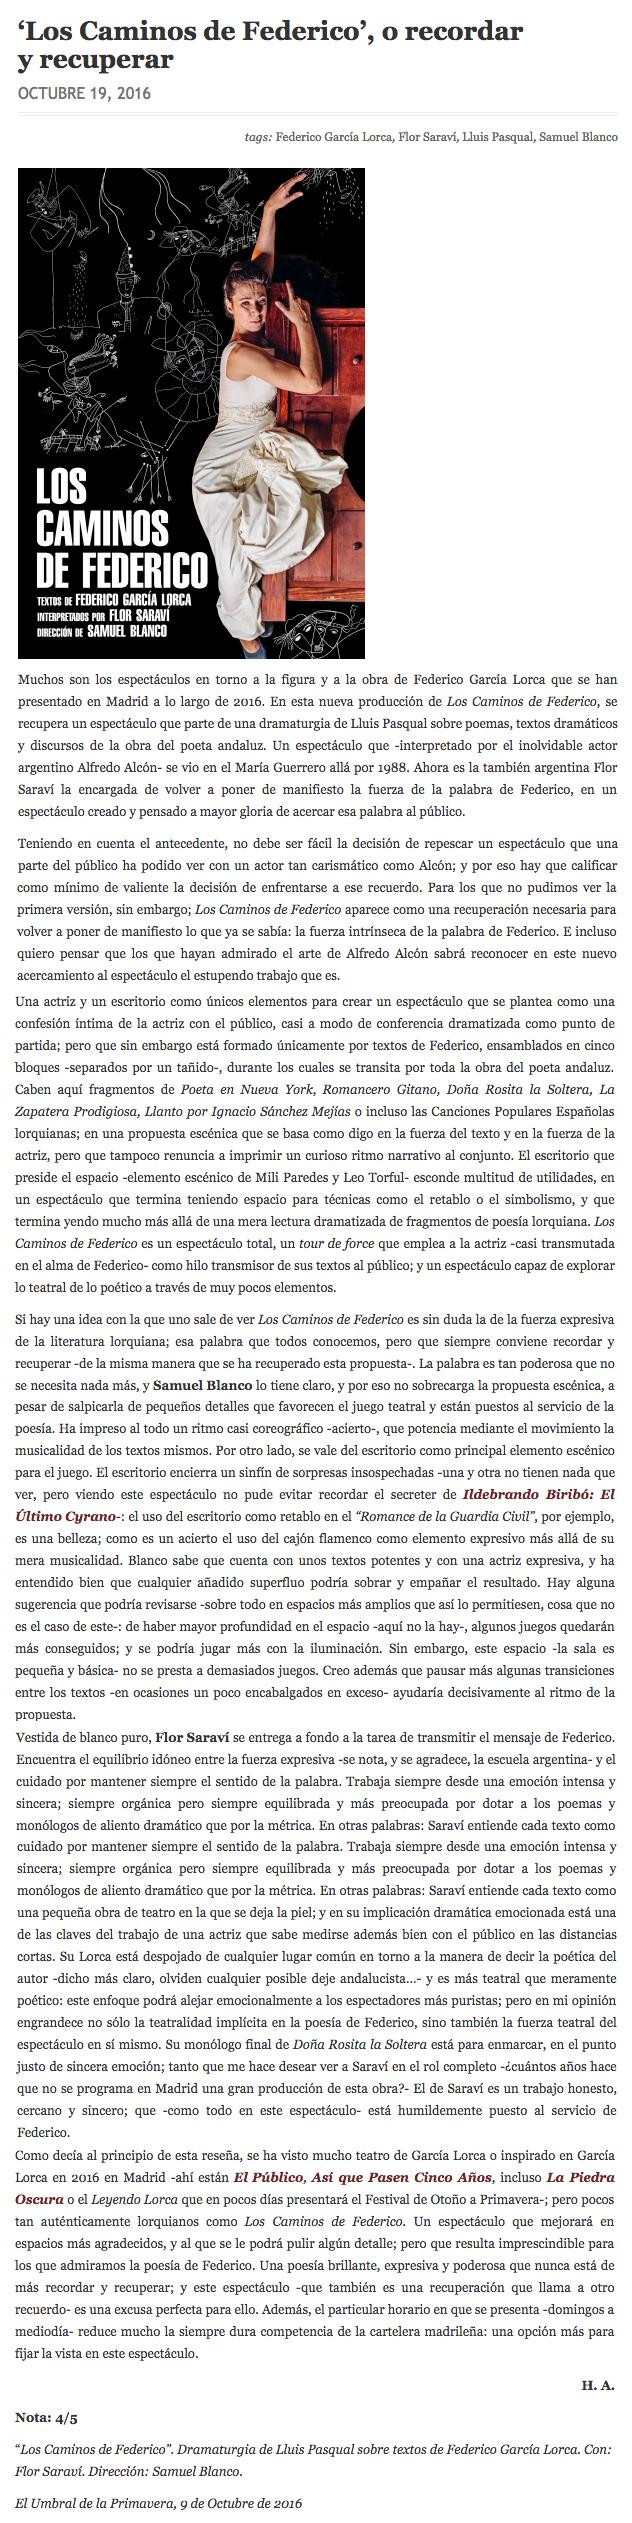 critica-butaca-en-anfiteatro-x-16